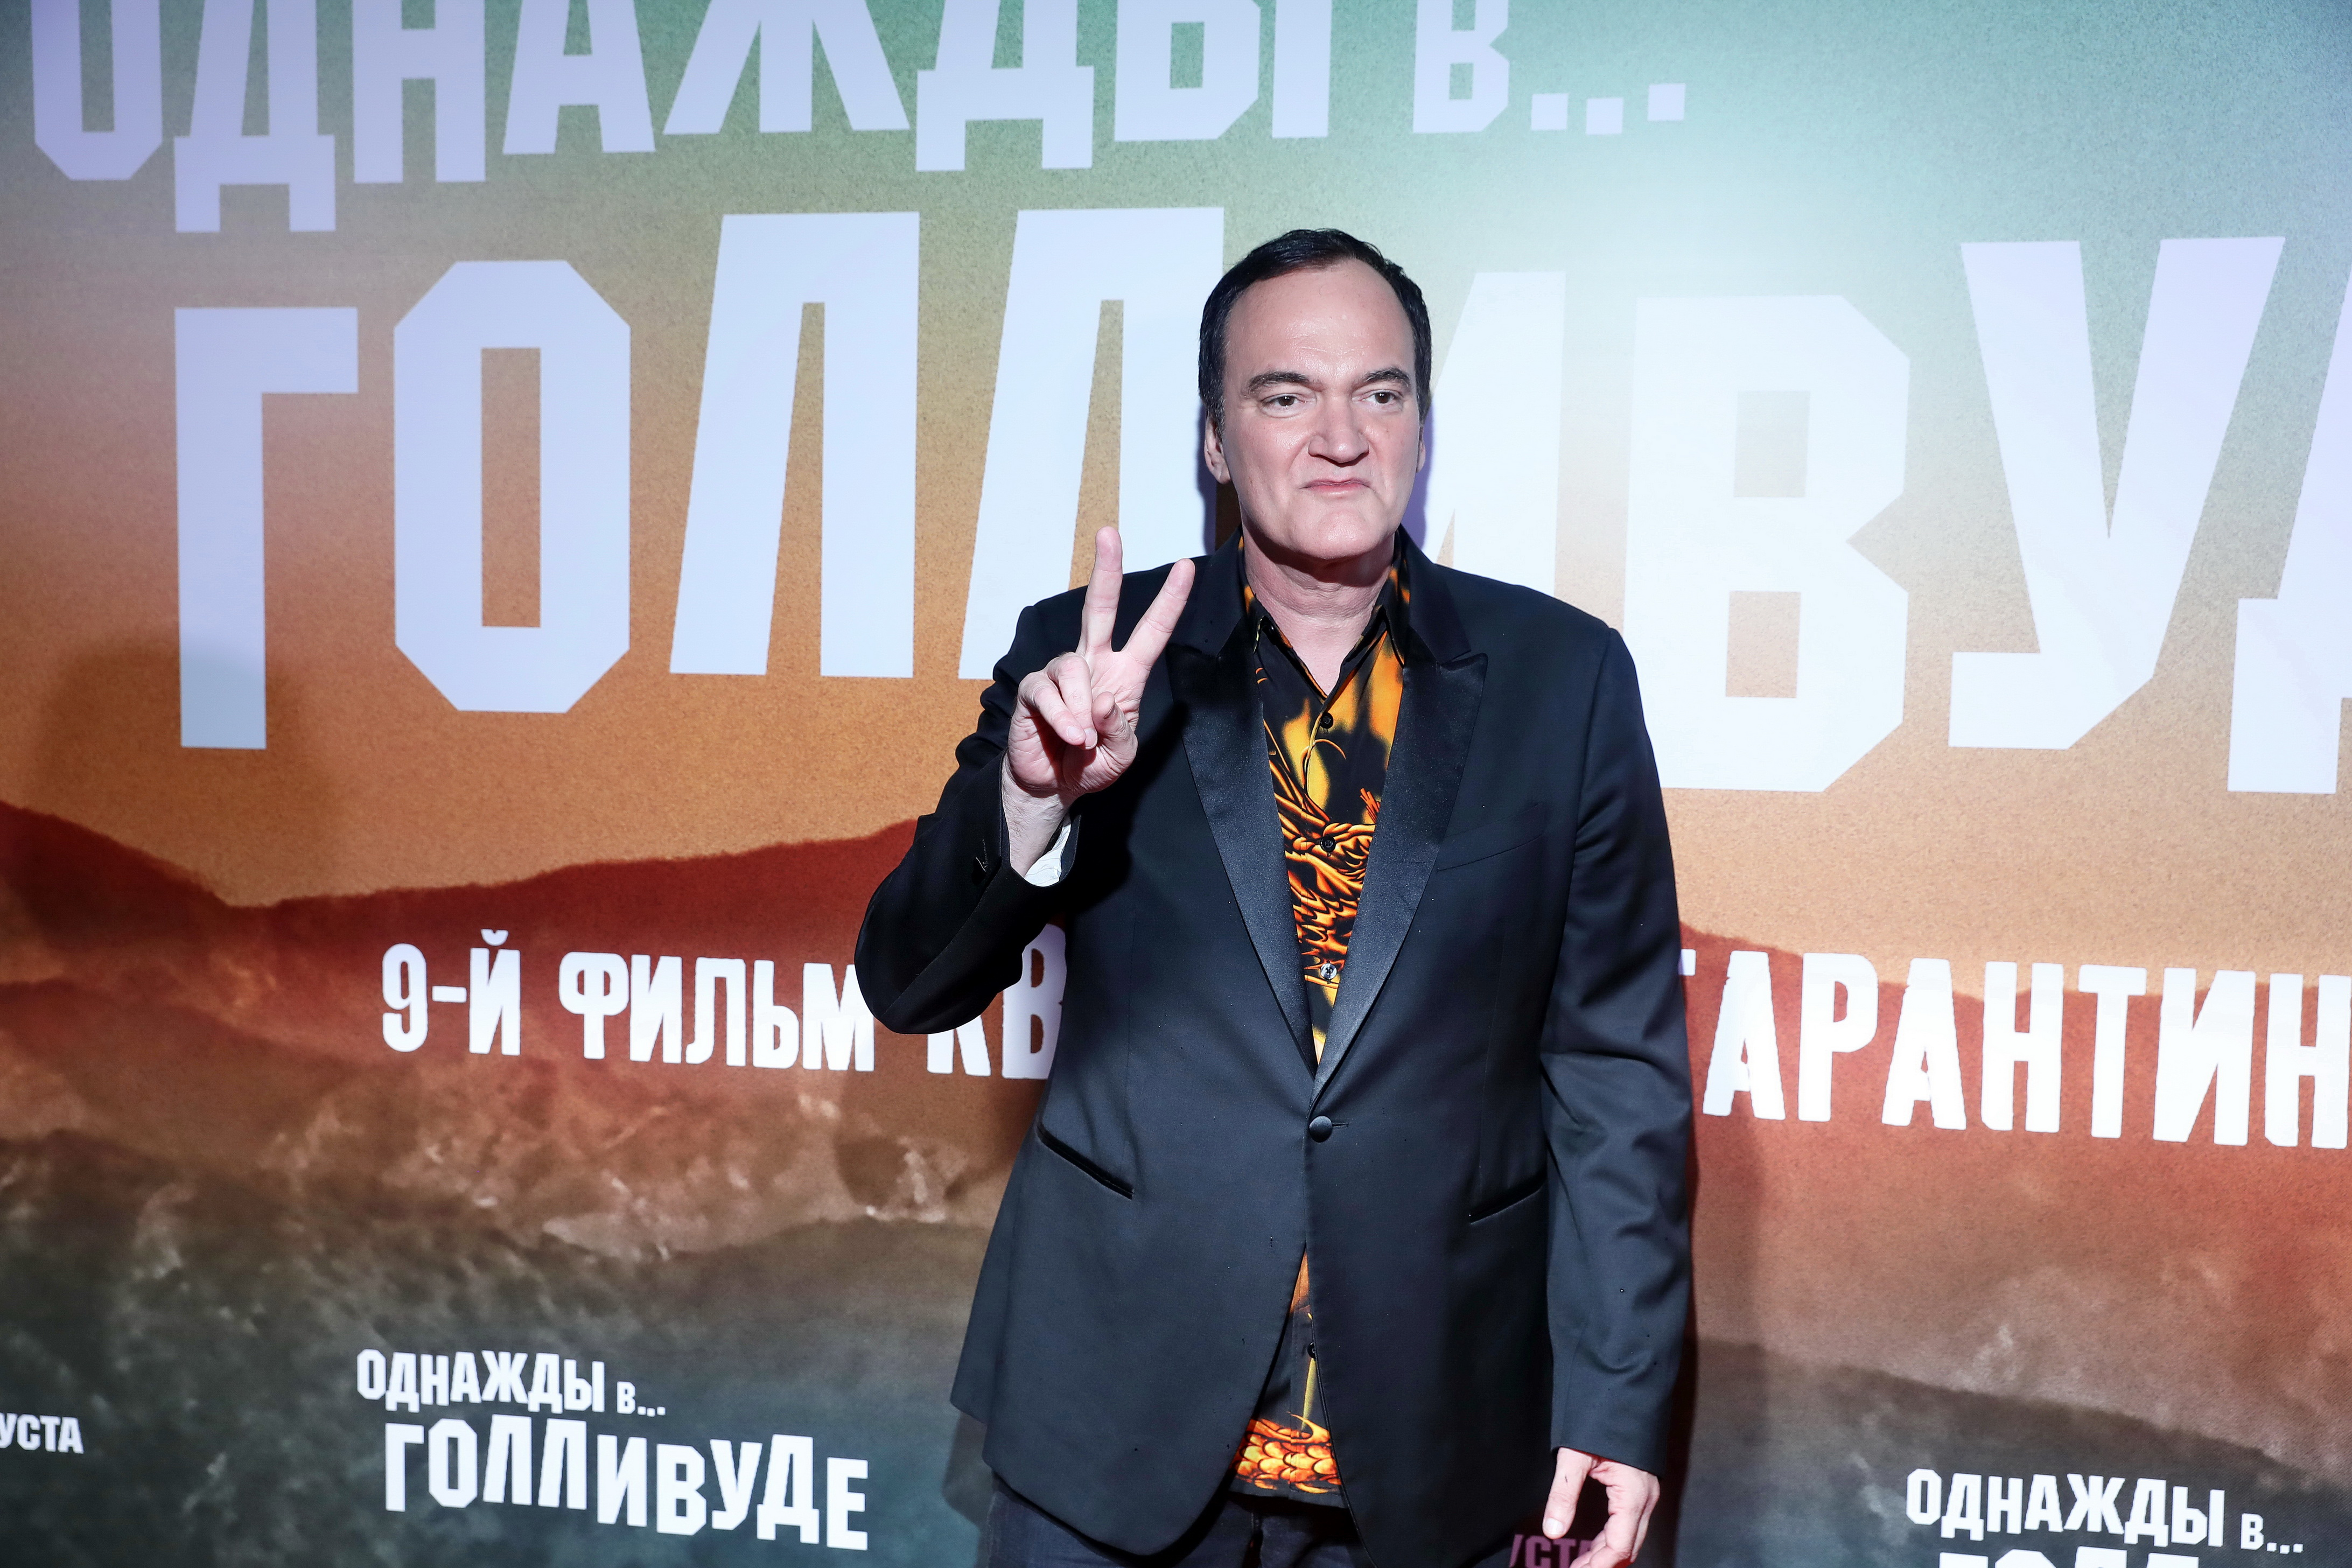 Acting 2019, Chris Yandek, Entertainment News 2019, Movies 2019, News 2019, Quentin Tarantino 2019, Quentin Tarantino Moscow Russia, Quentin Tarantino Russia 2019